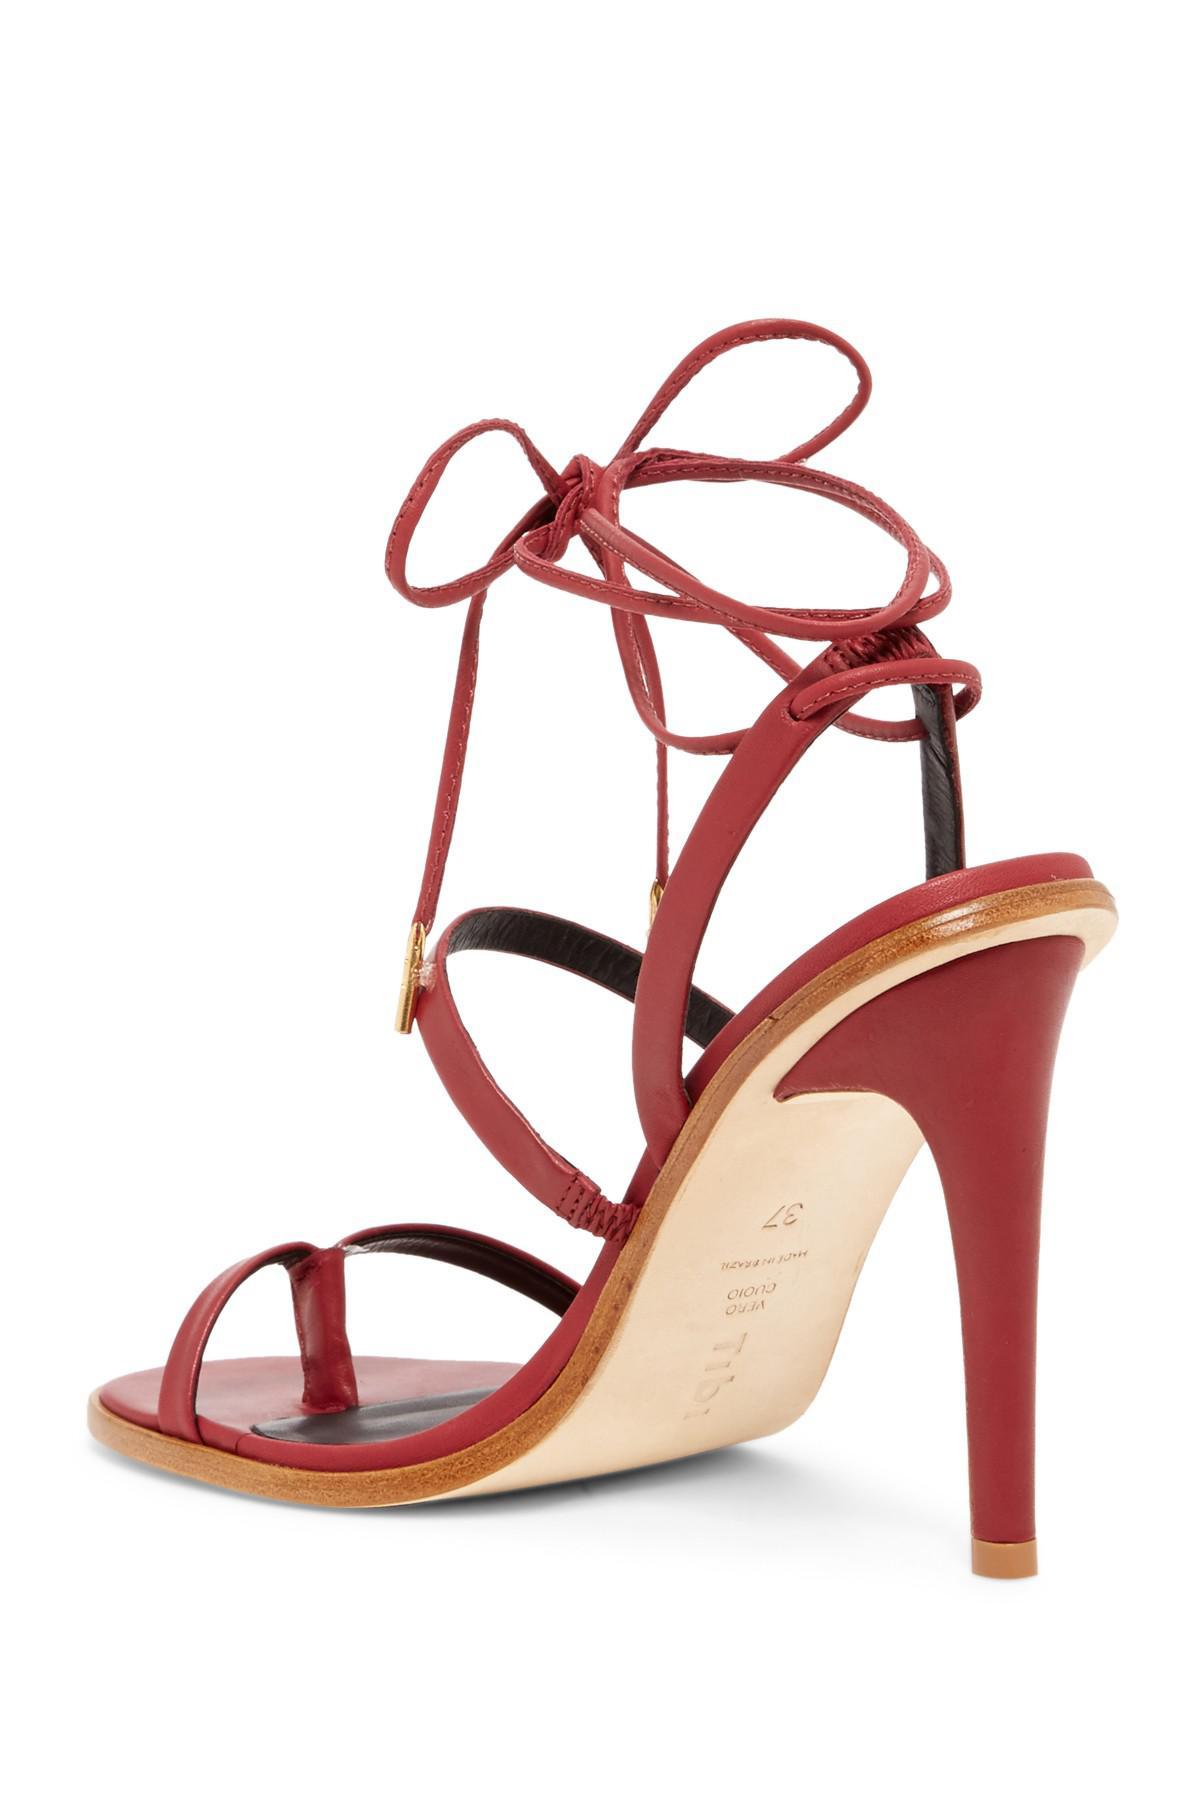 cbe98705e79 Lyst - Tibi Amber Ii Ankle Lace Sandal